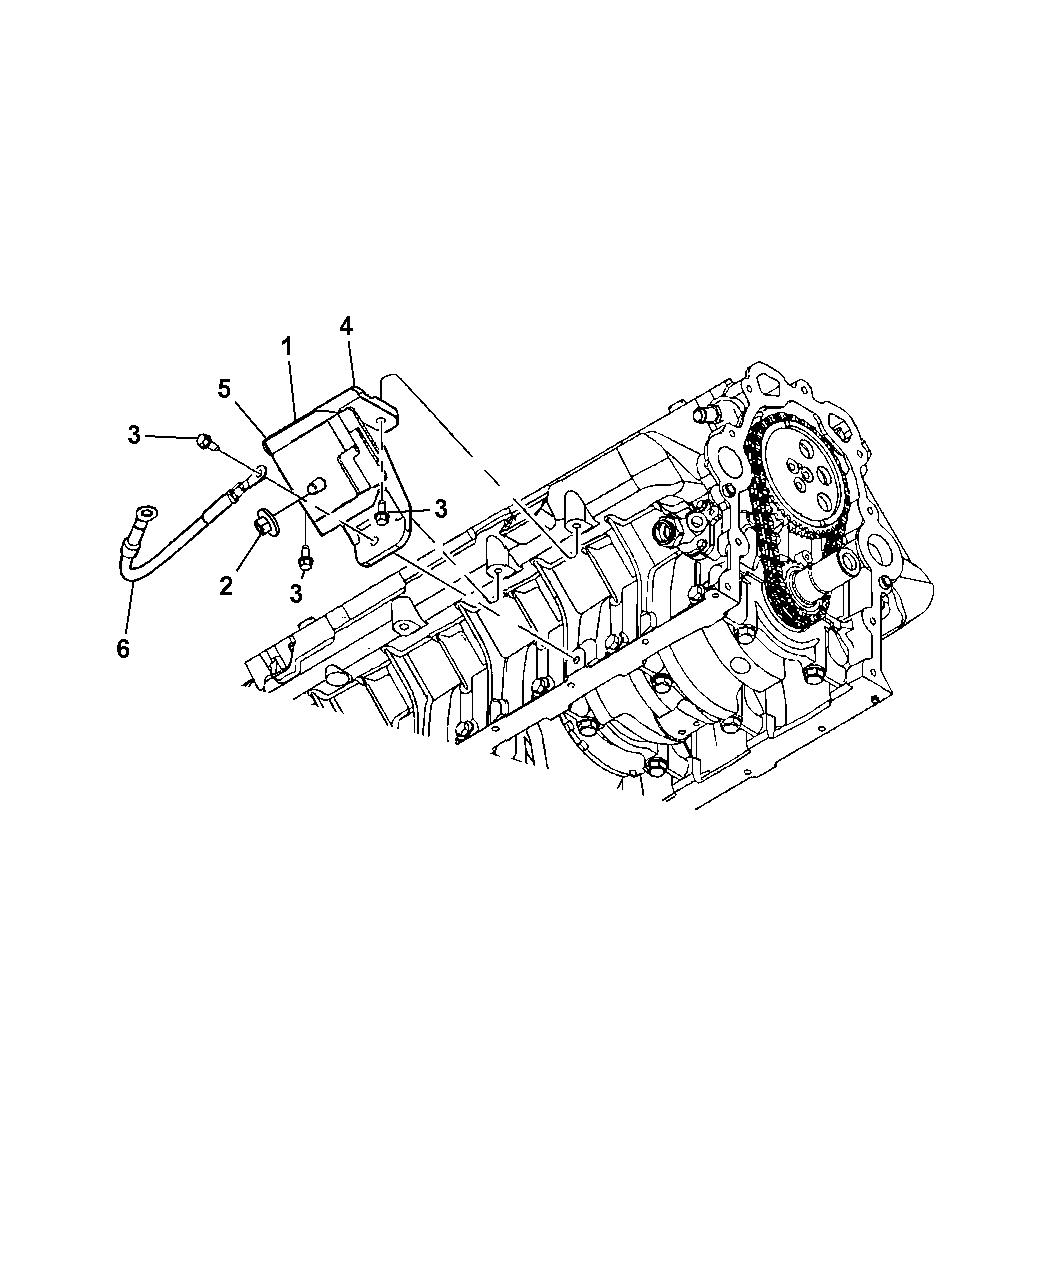 mopar 4643530ab katana engine diagram viper engine diagram #11